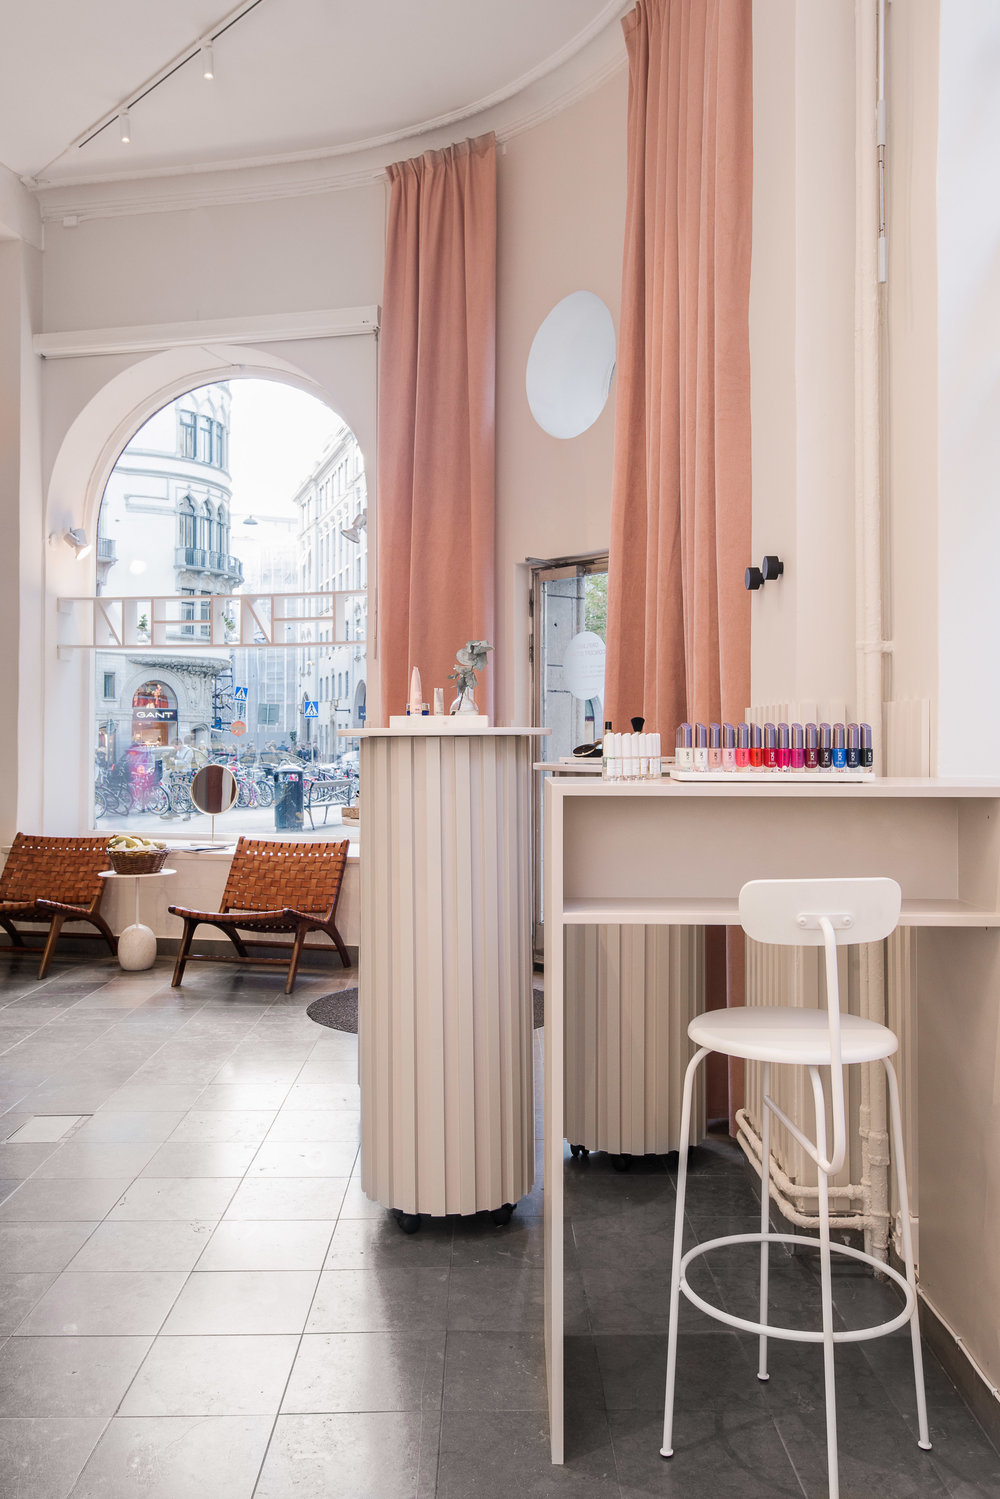 Inredningsarkitekt stockholm butik oriflame 4